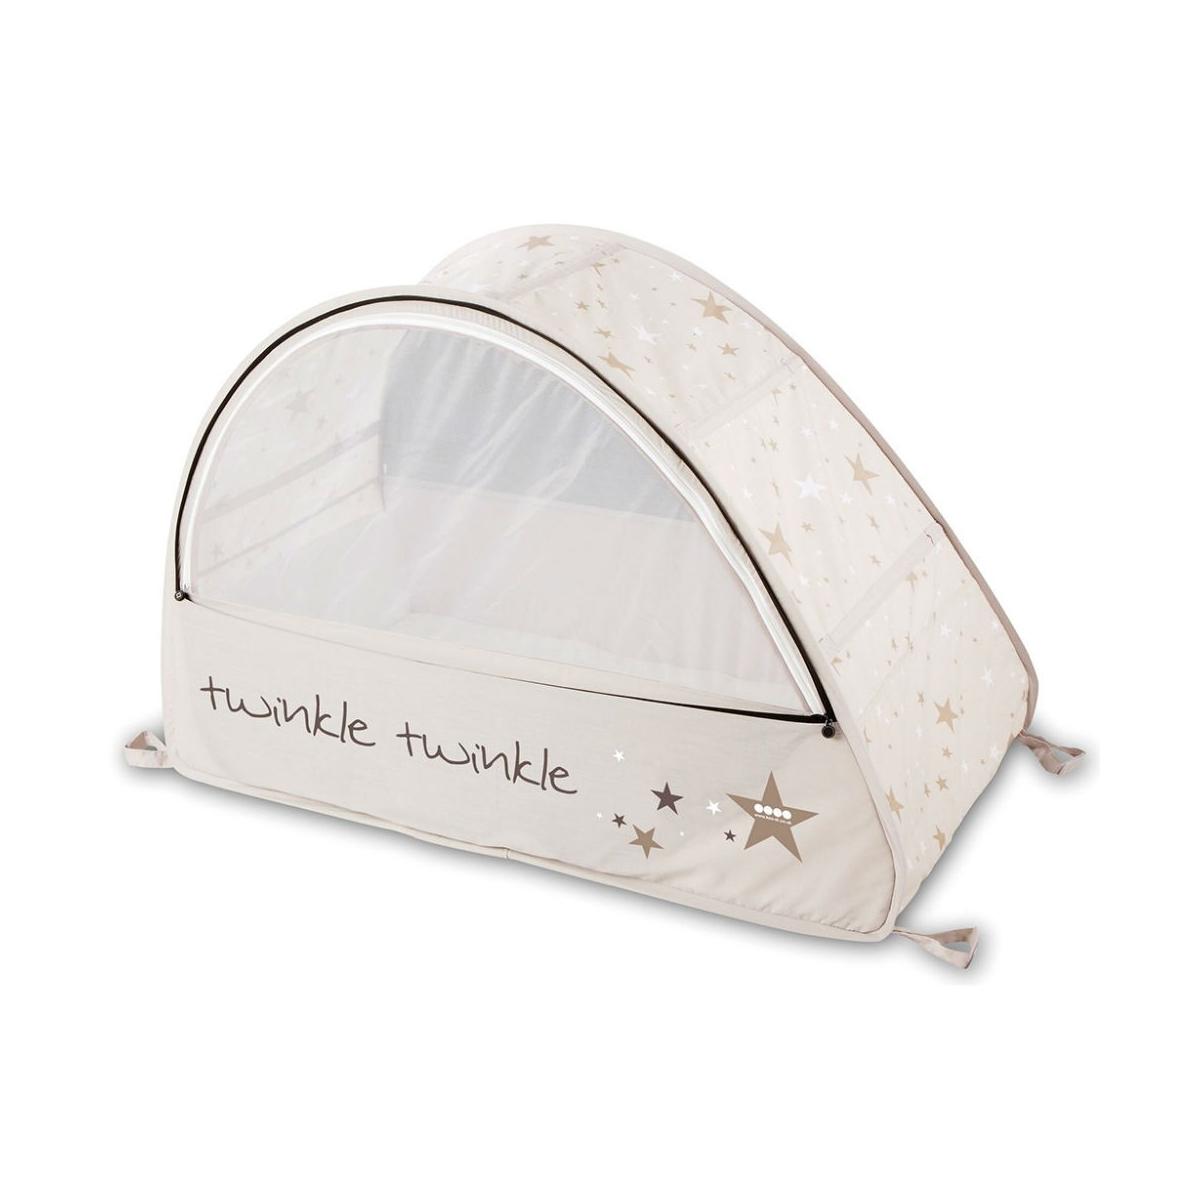 Koo Di Pop Up Sun & Sleep Travel Bubble Cot Twinkle Twinkle (NEW)